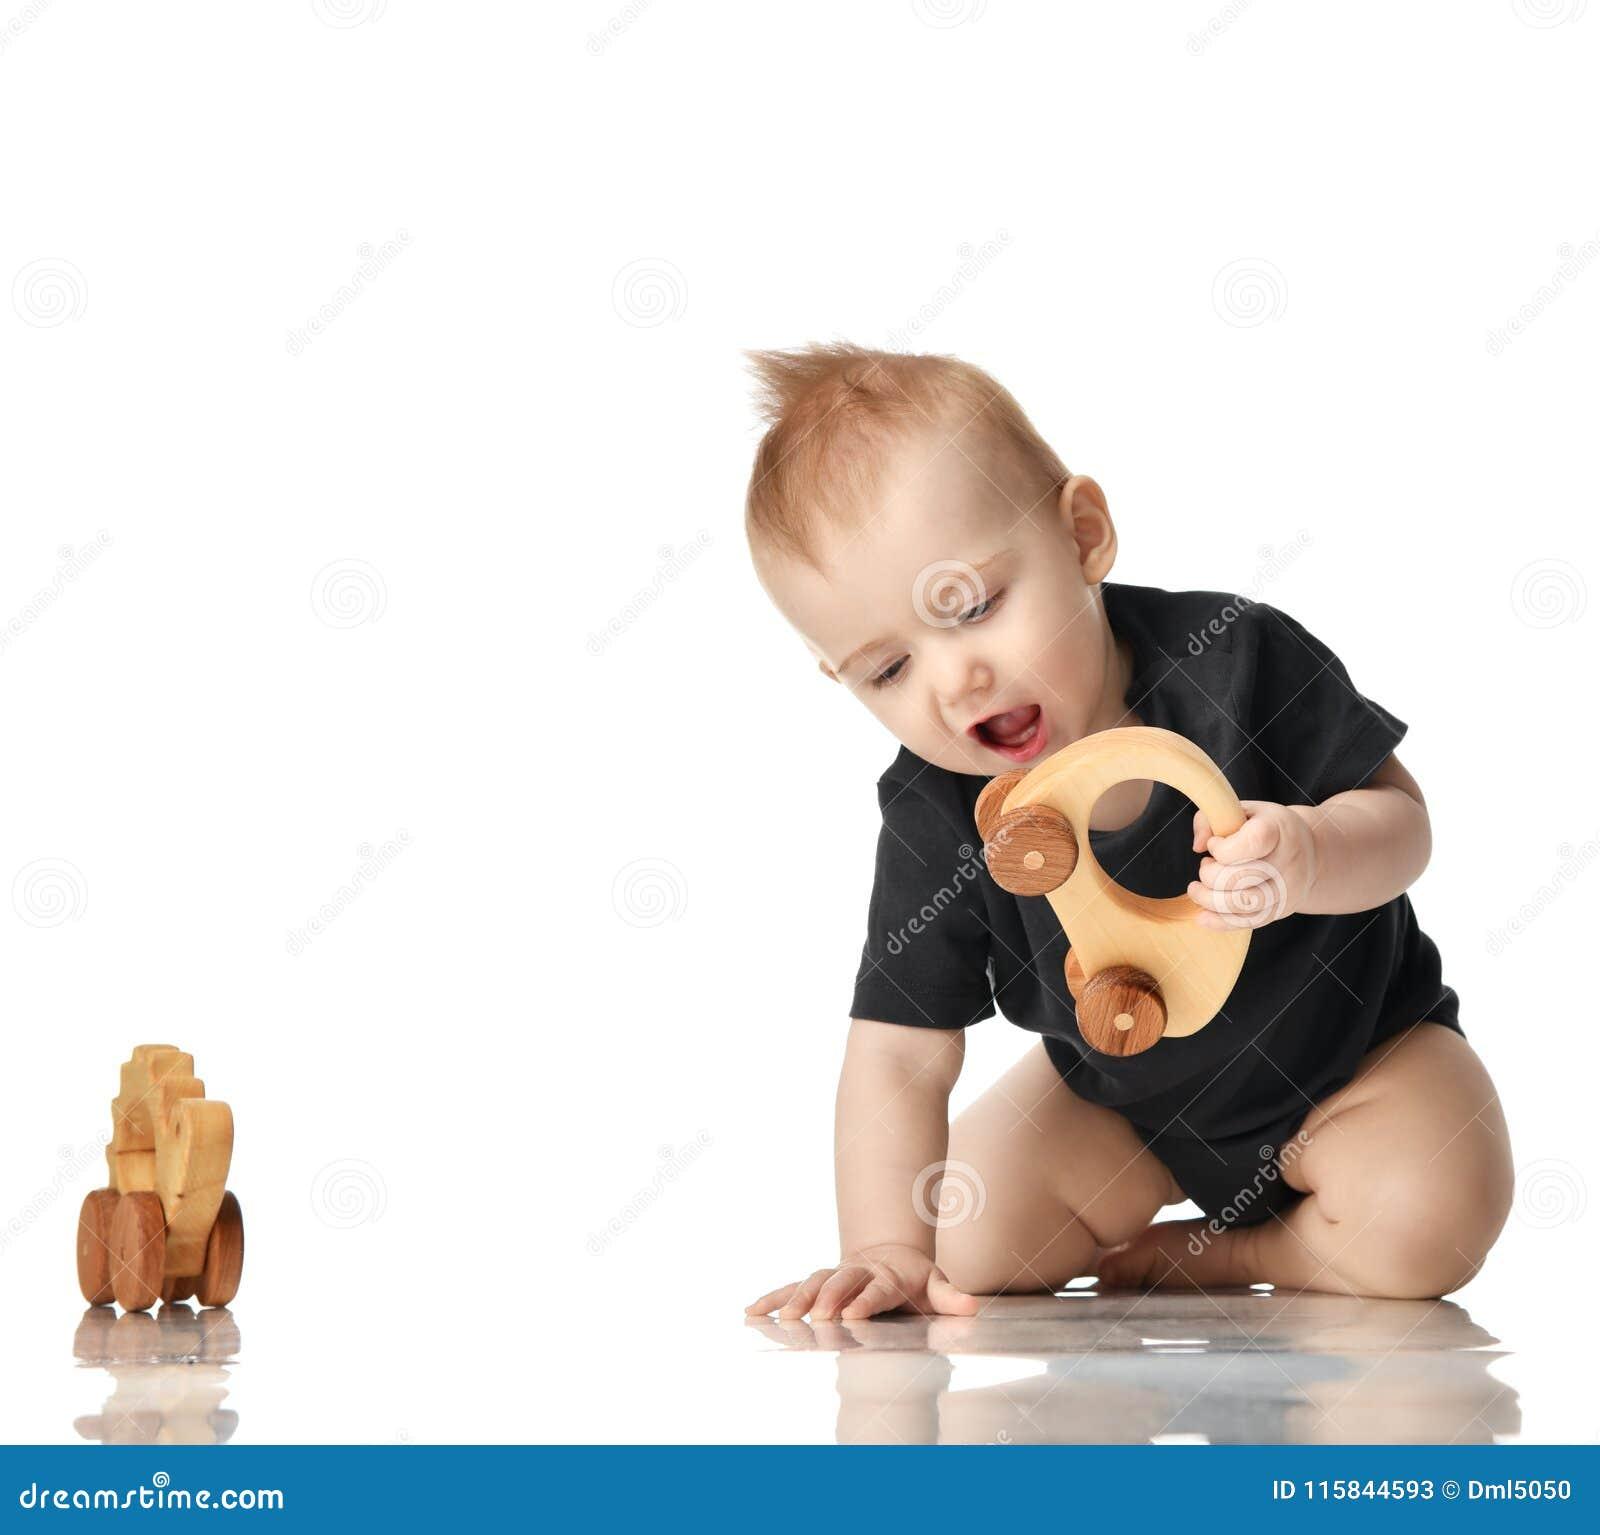 Juguetes Bebe De 8 Meses.Nino Infantil Del Bebe Del Nino De 8 Meses Que Se Sienta En